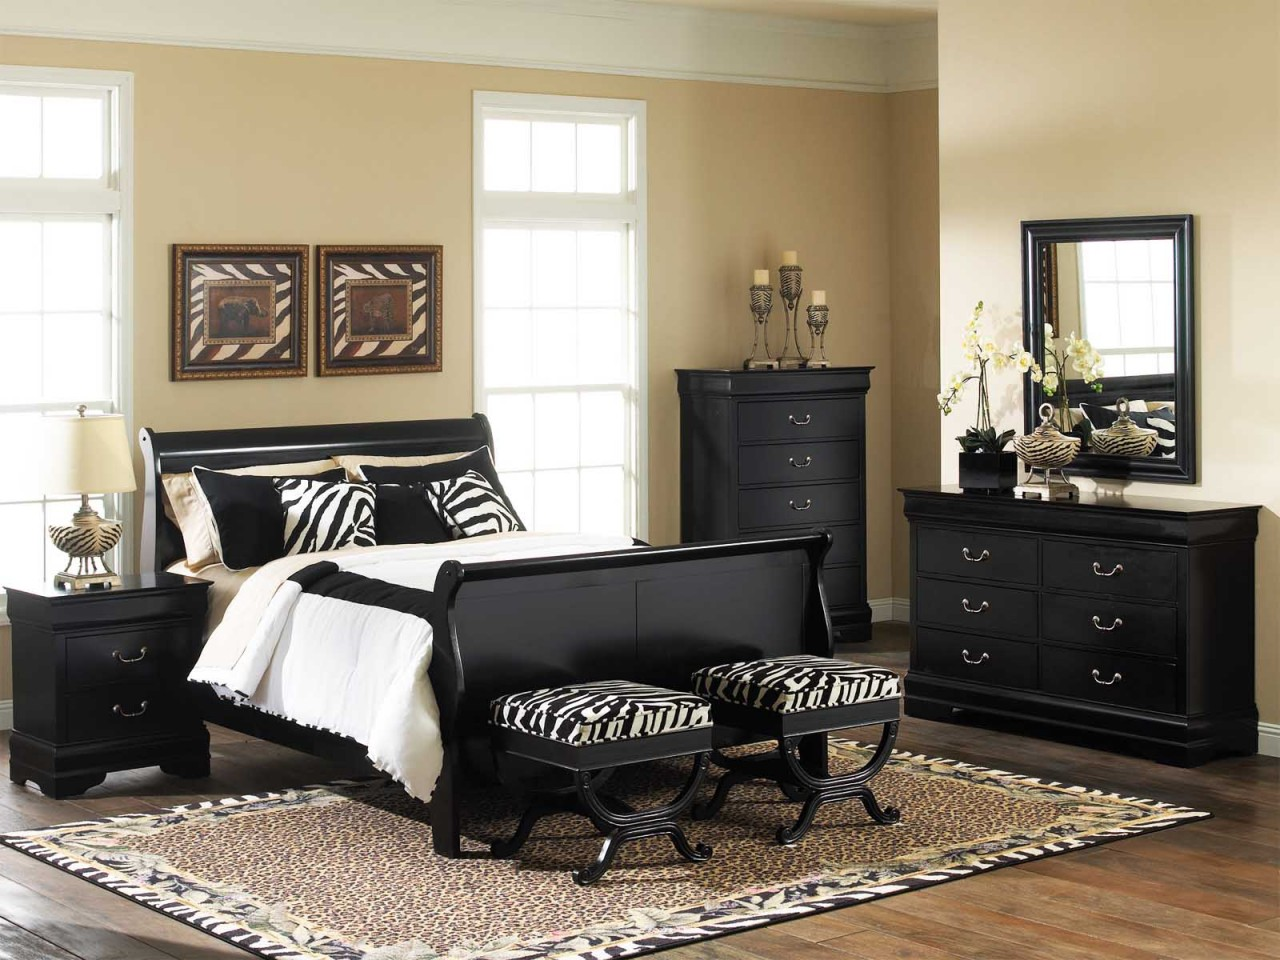 black liberty bedroom furniture photo - 8